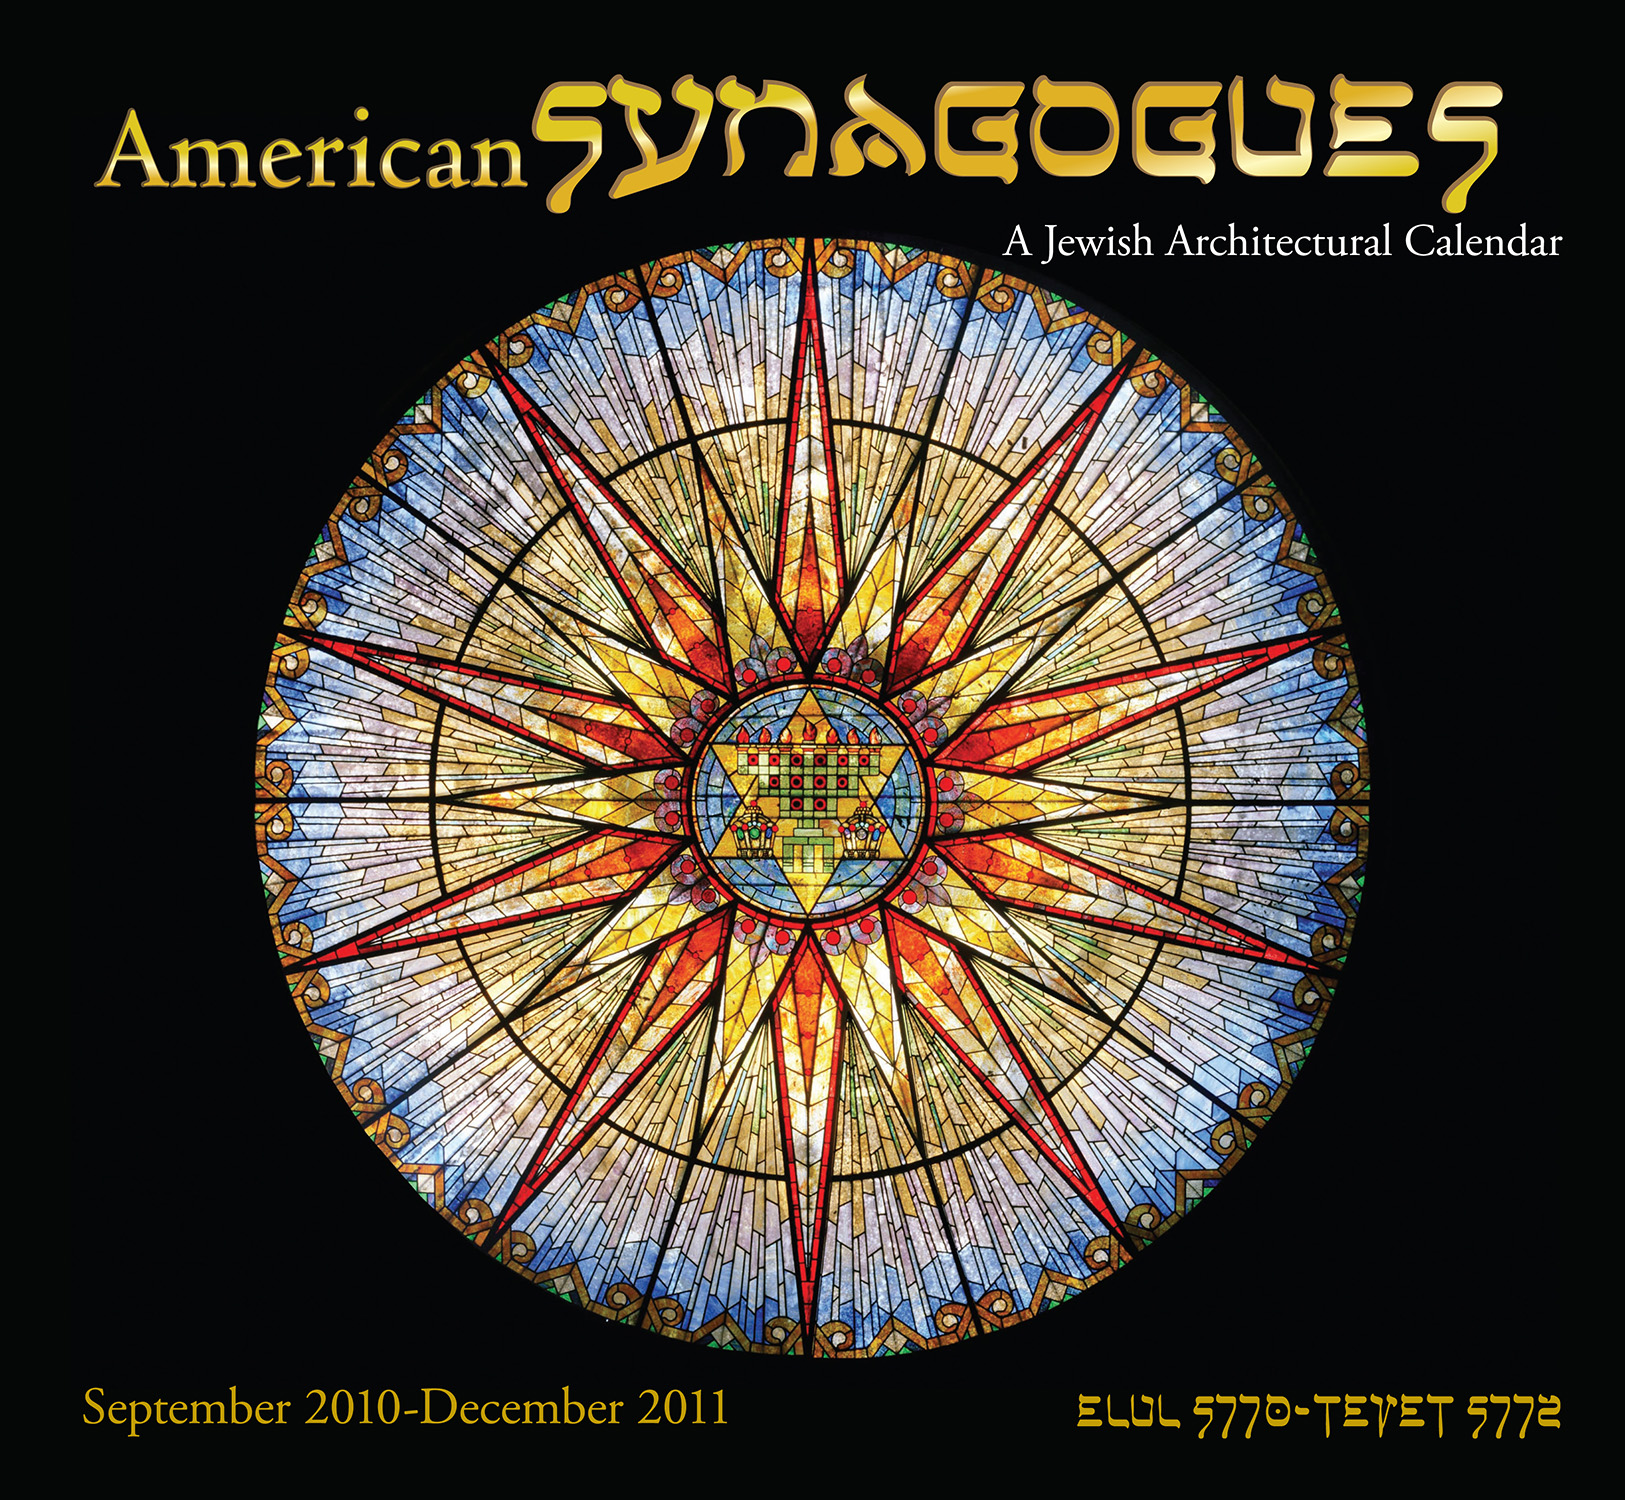 American Synagogues Calendar